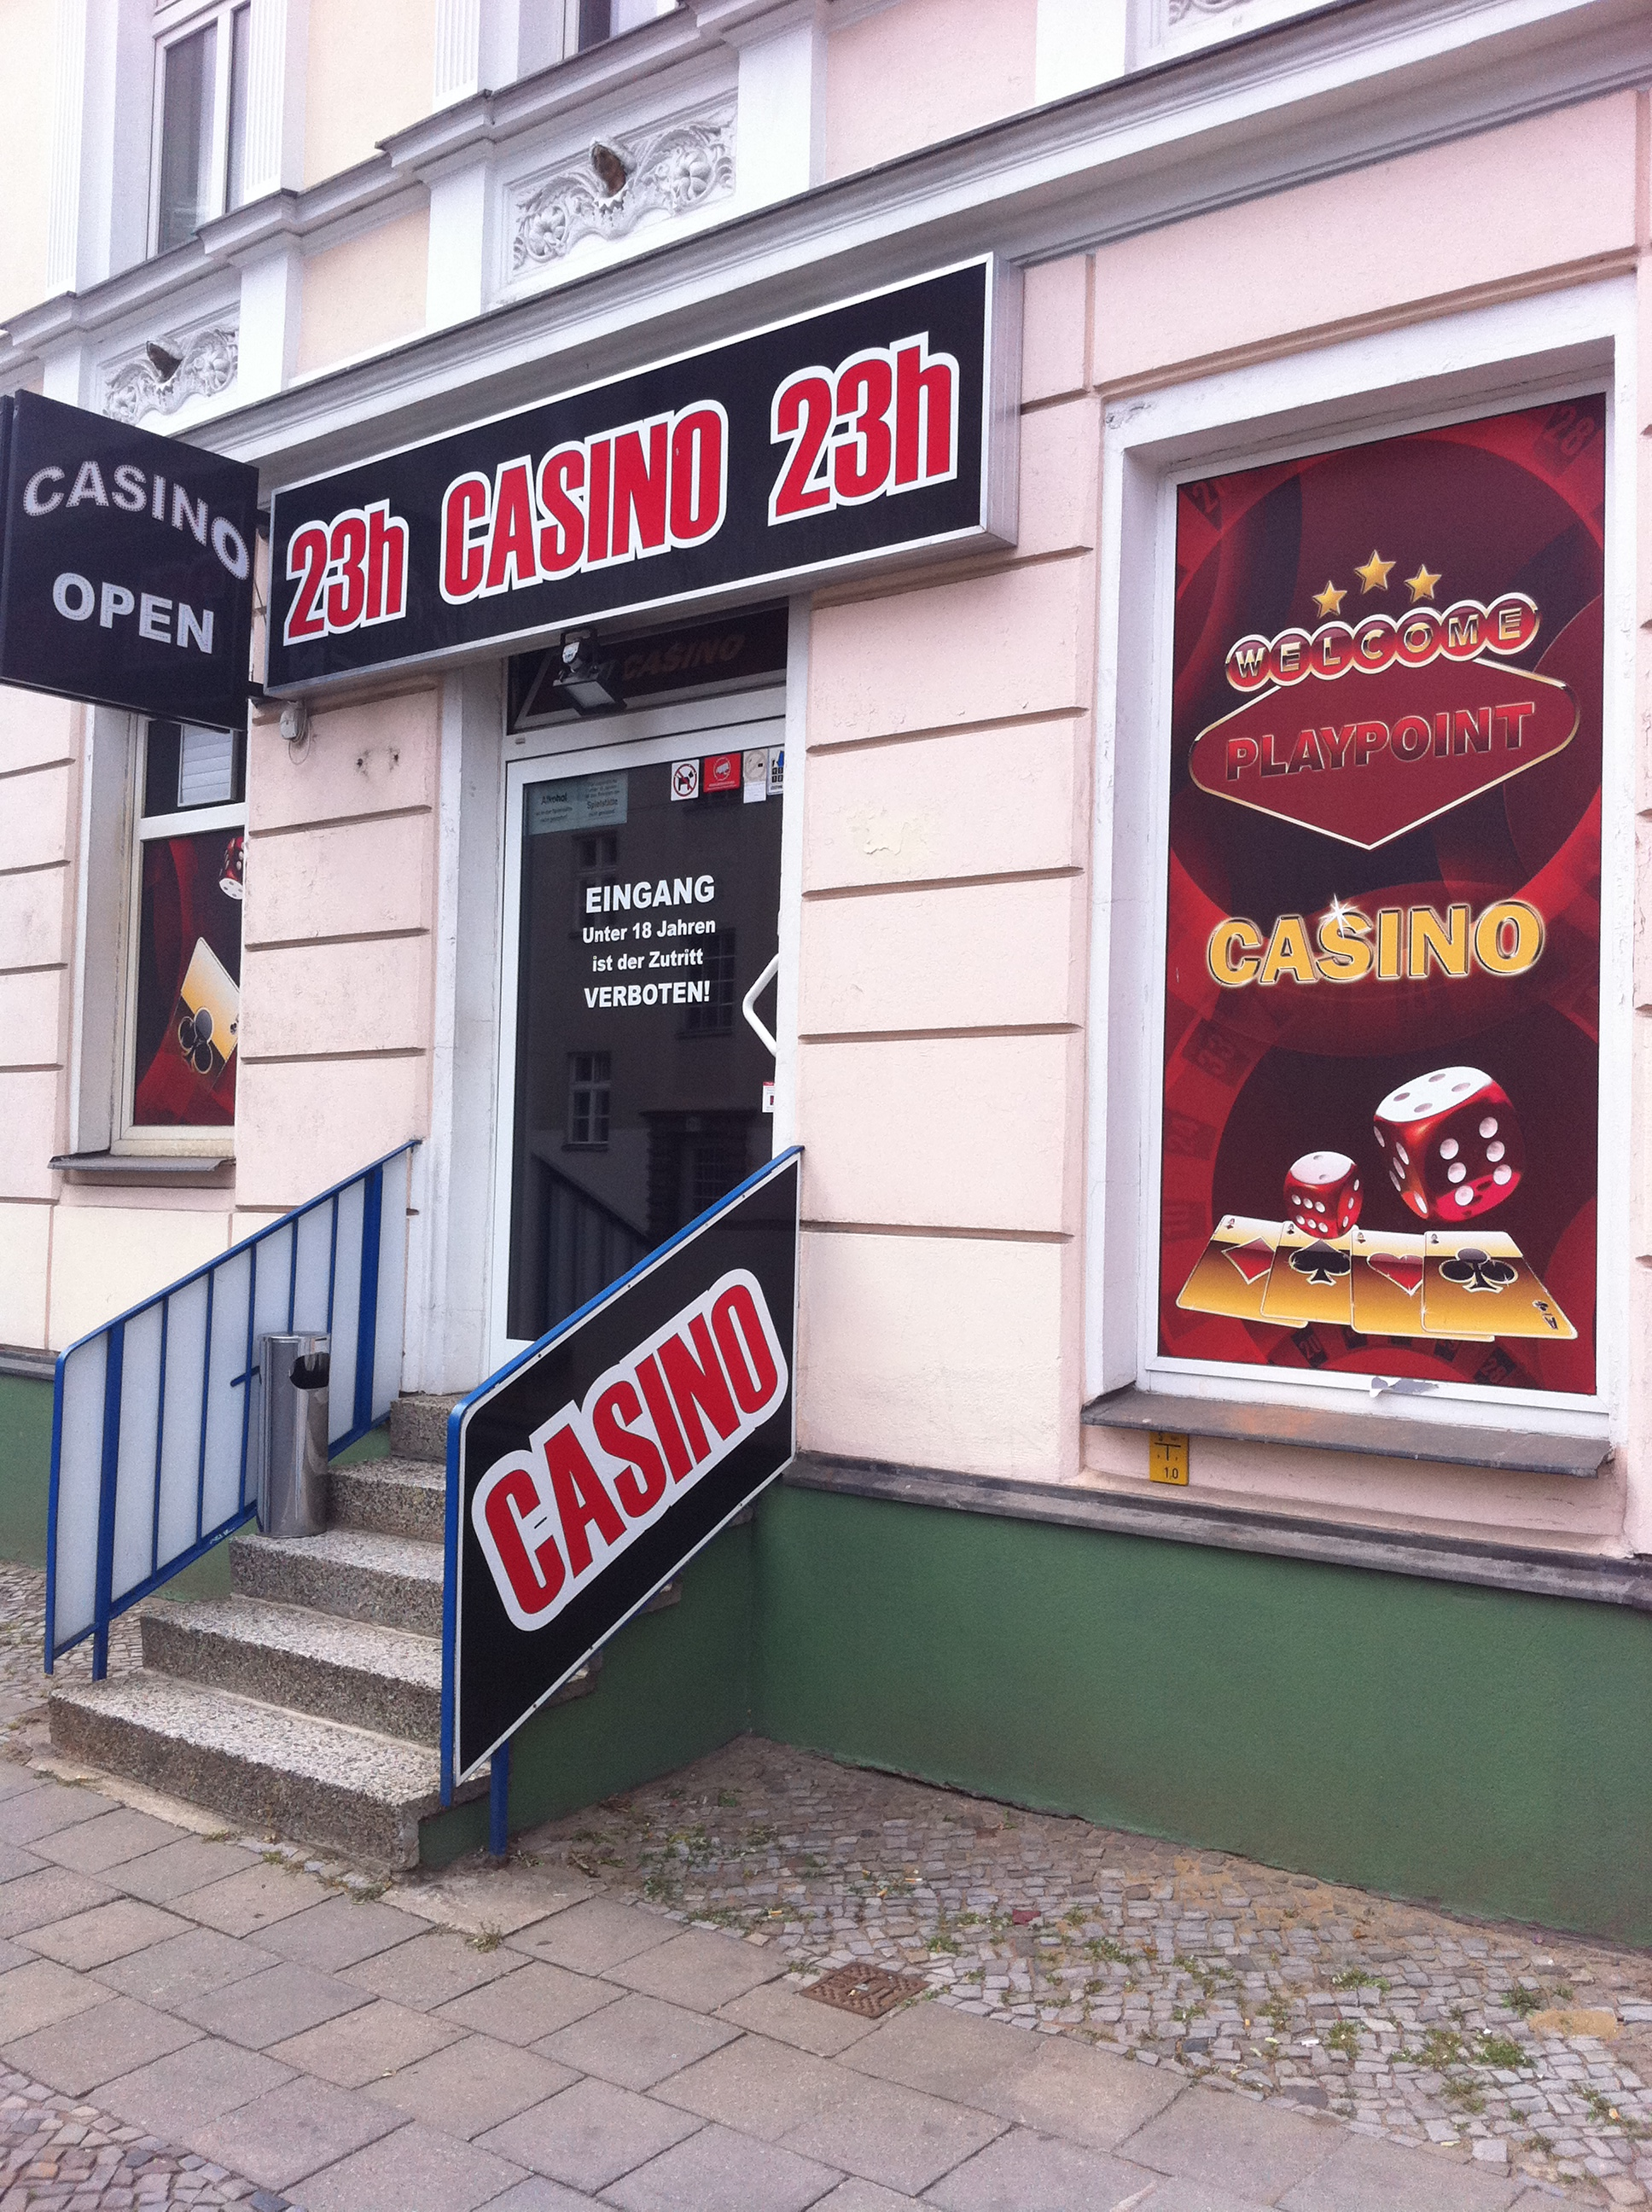 Pokerstars welcome offer